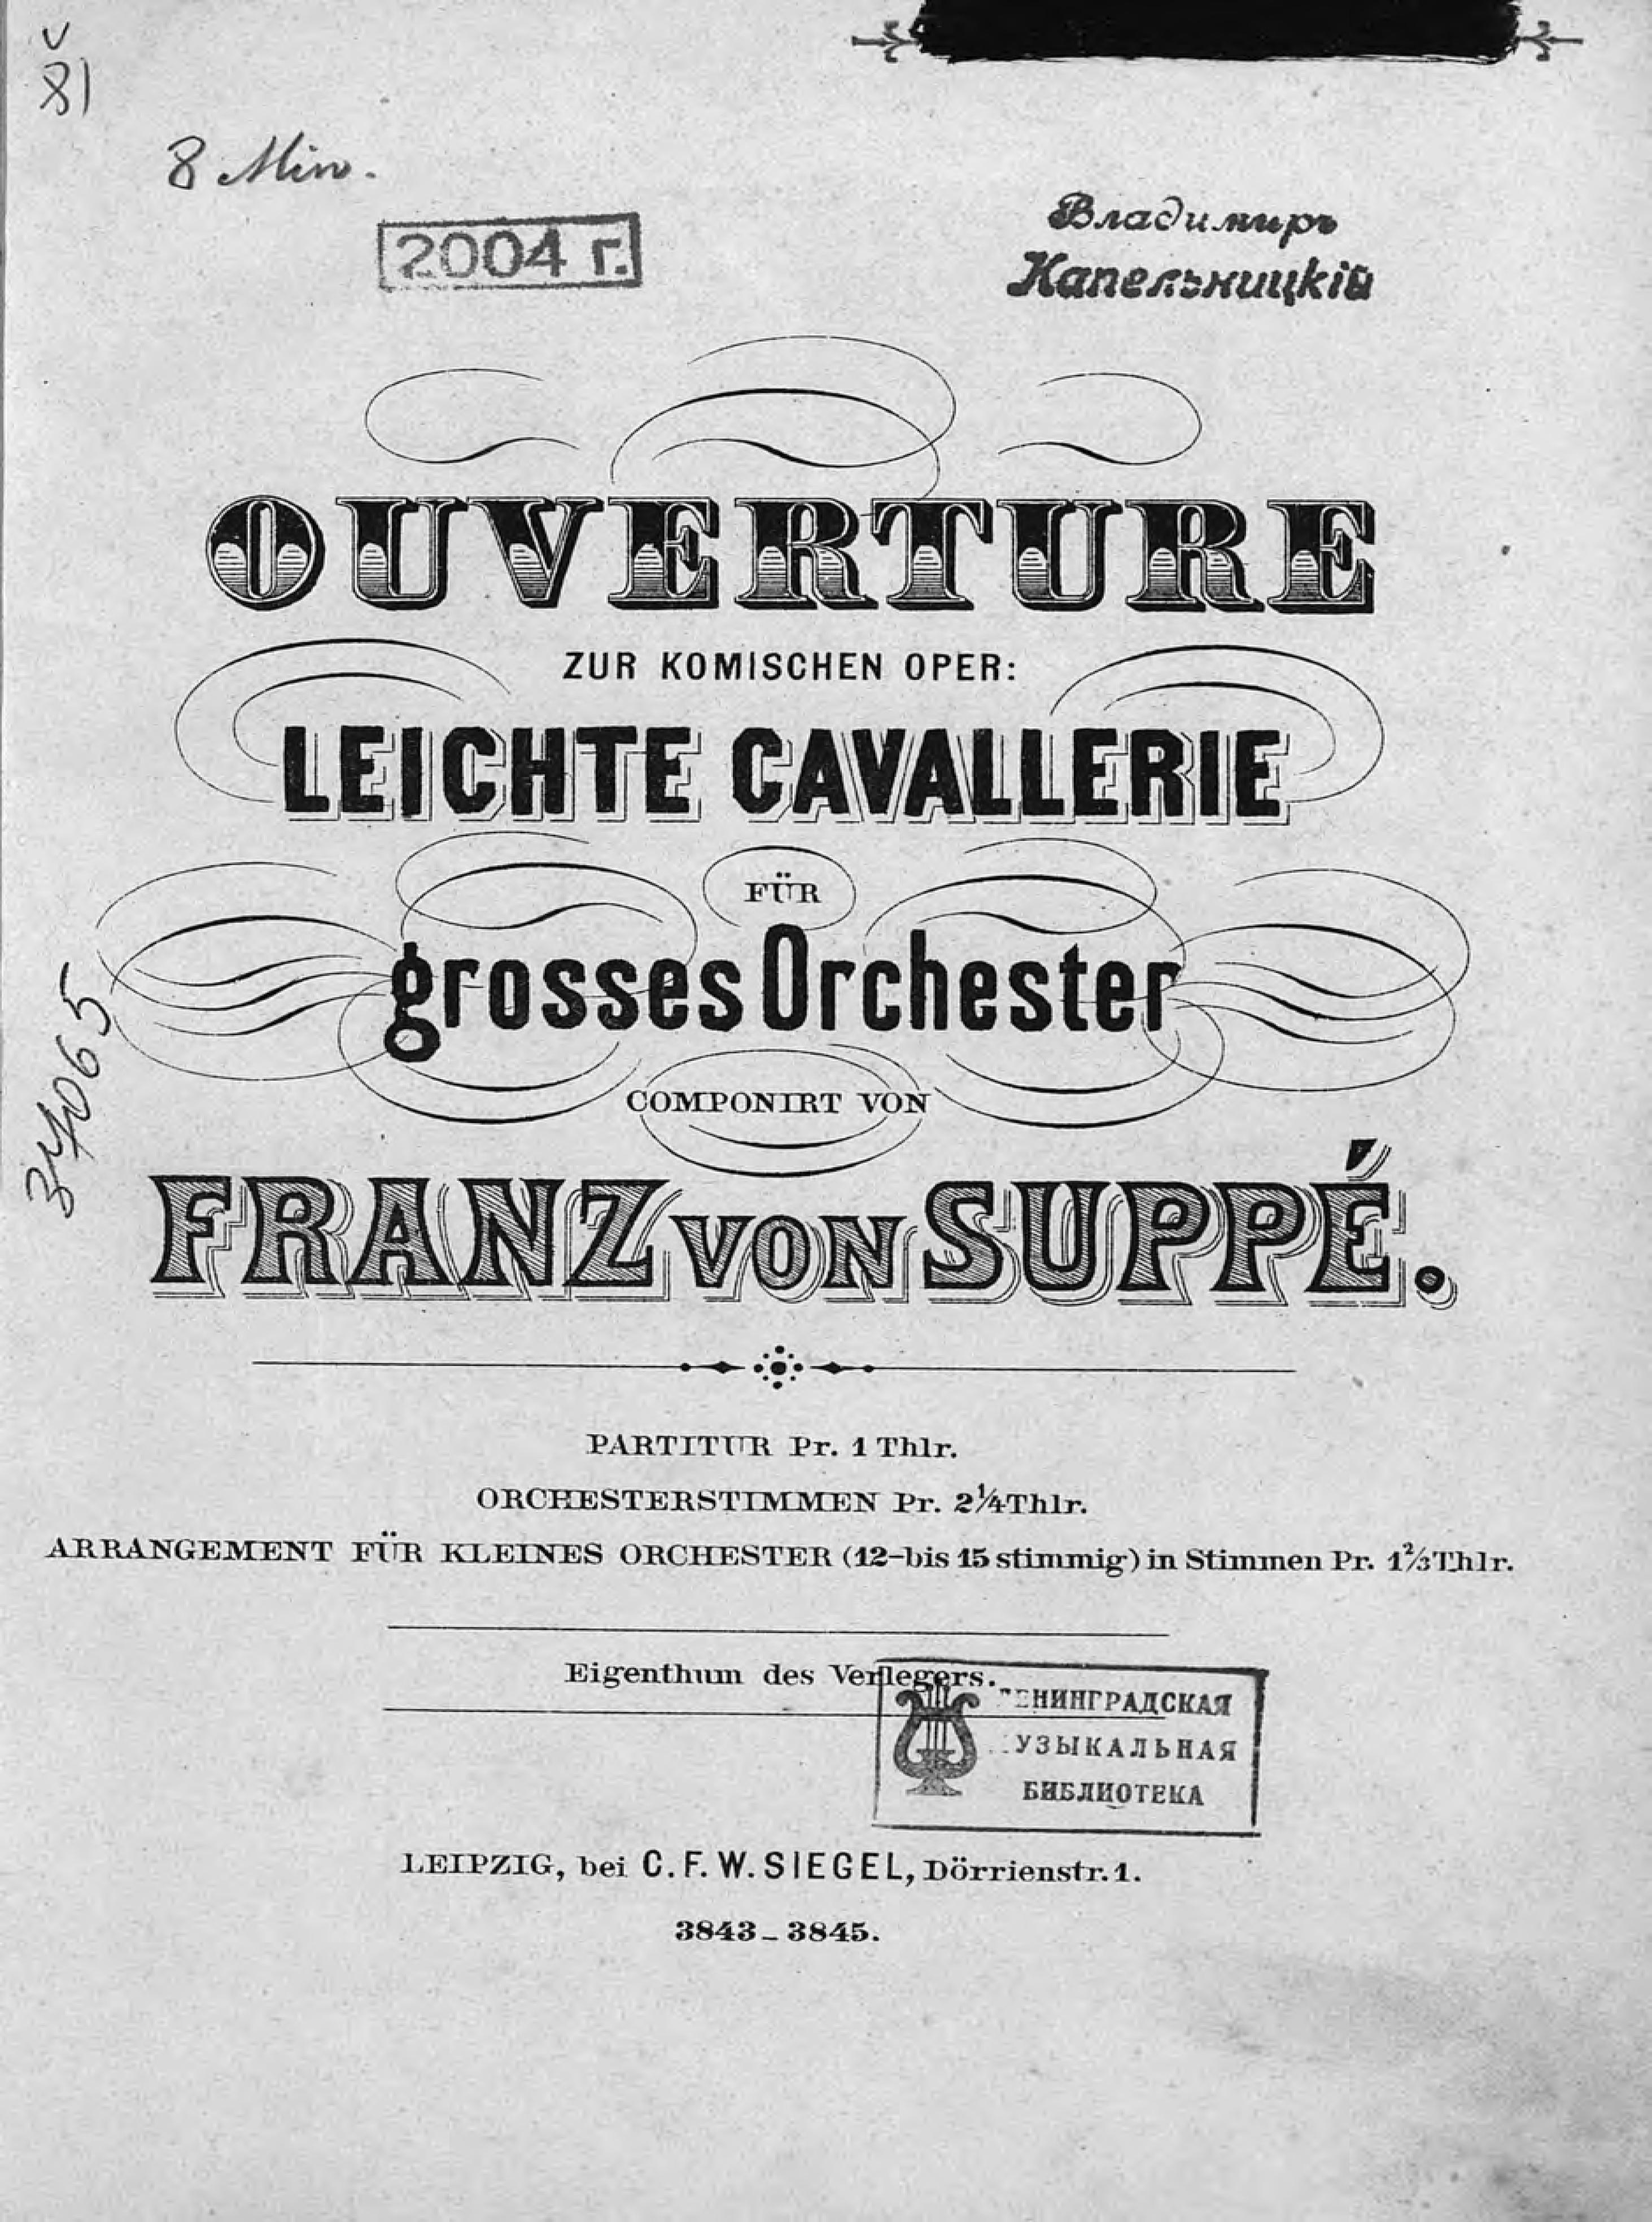 Франц фон Зуппе Ouverture zur komischen Oper Leichte Cavallerie w ostijn concert ouverture